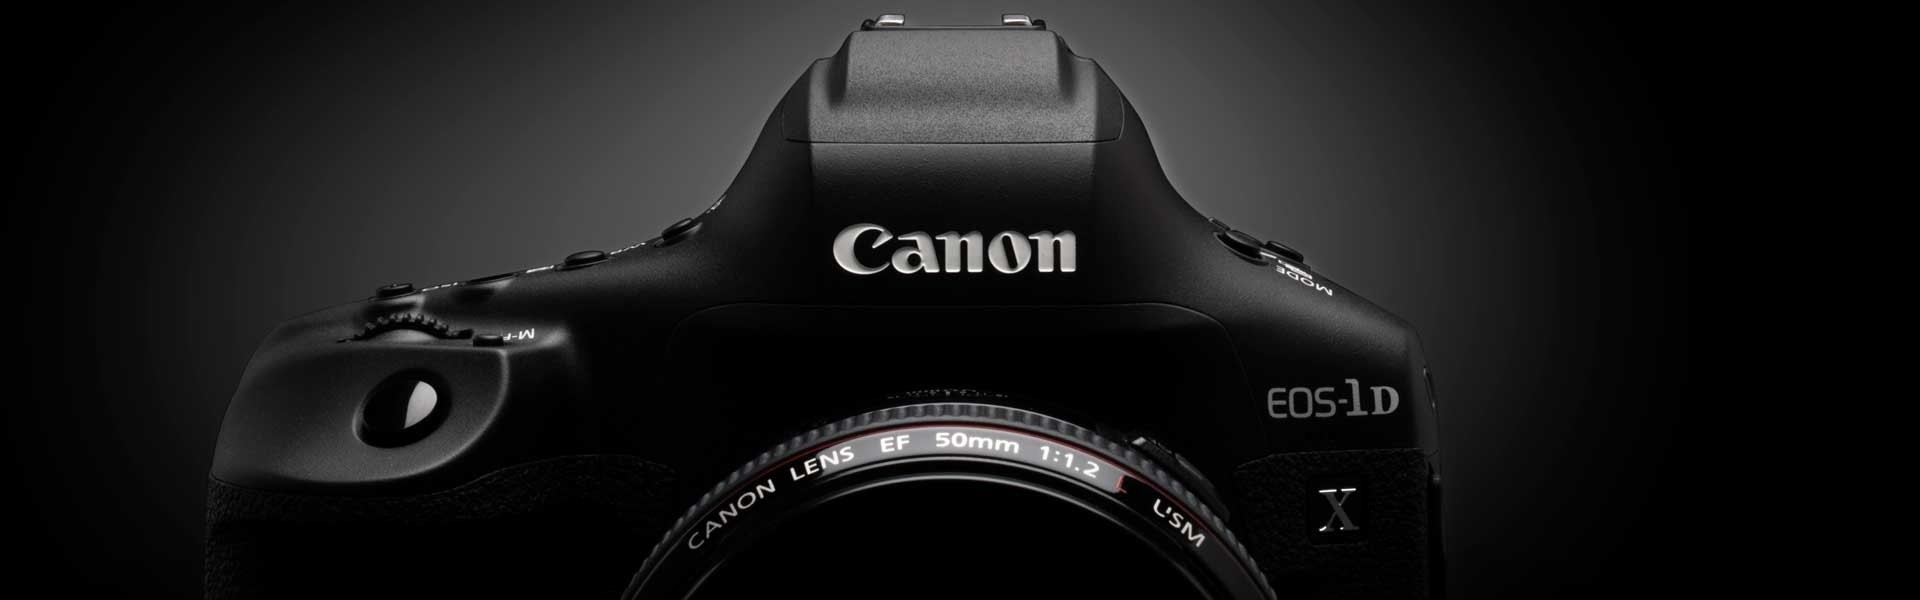 EOS-1D X Mark III, Vollformatkamera, Spiegelreflexkamera